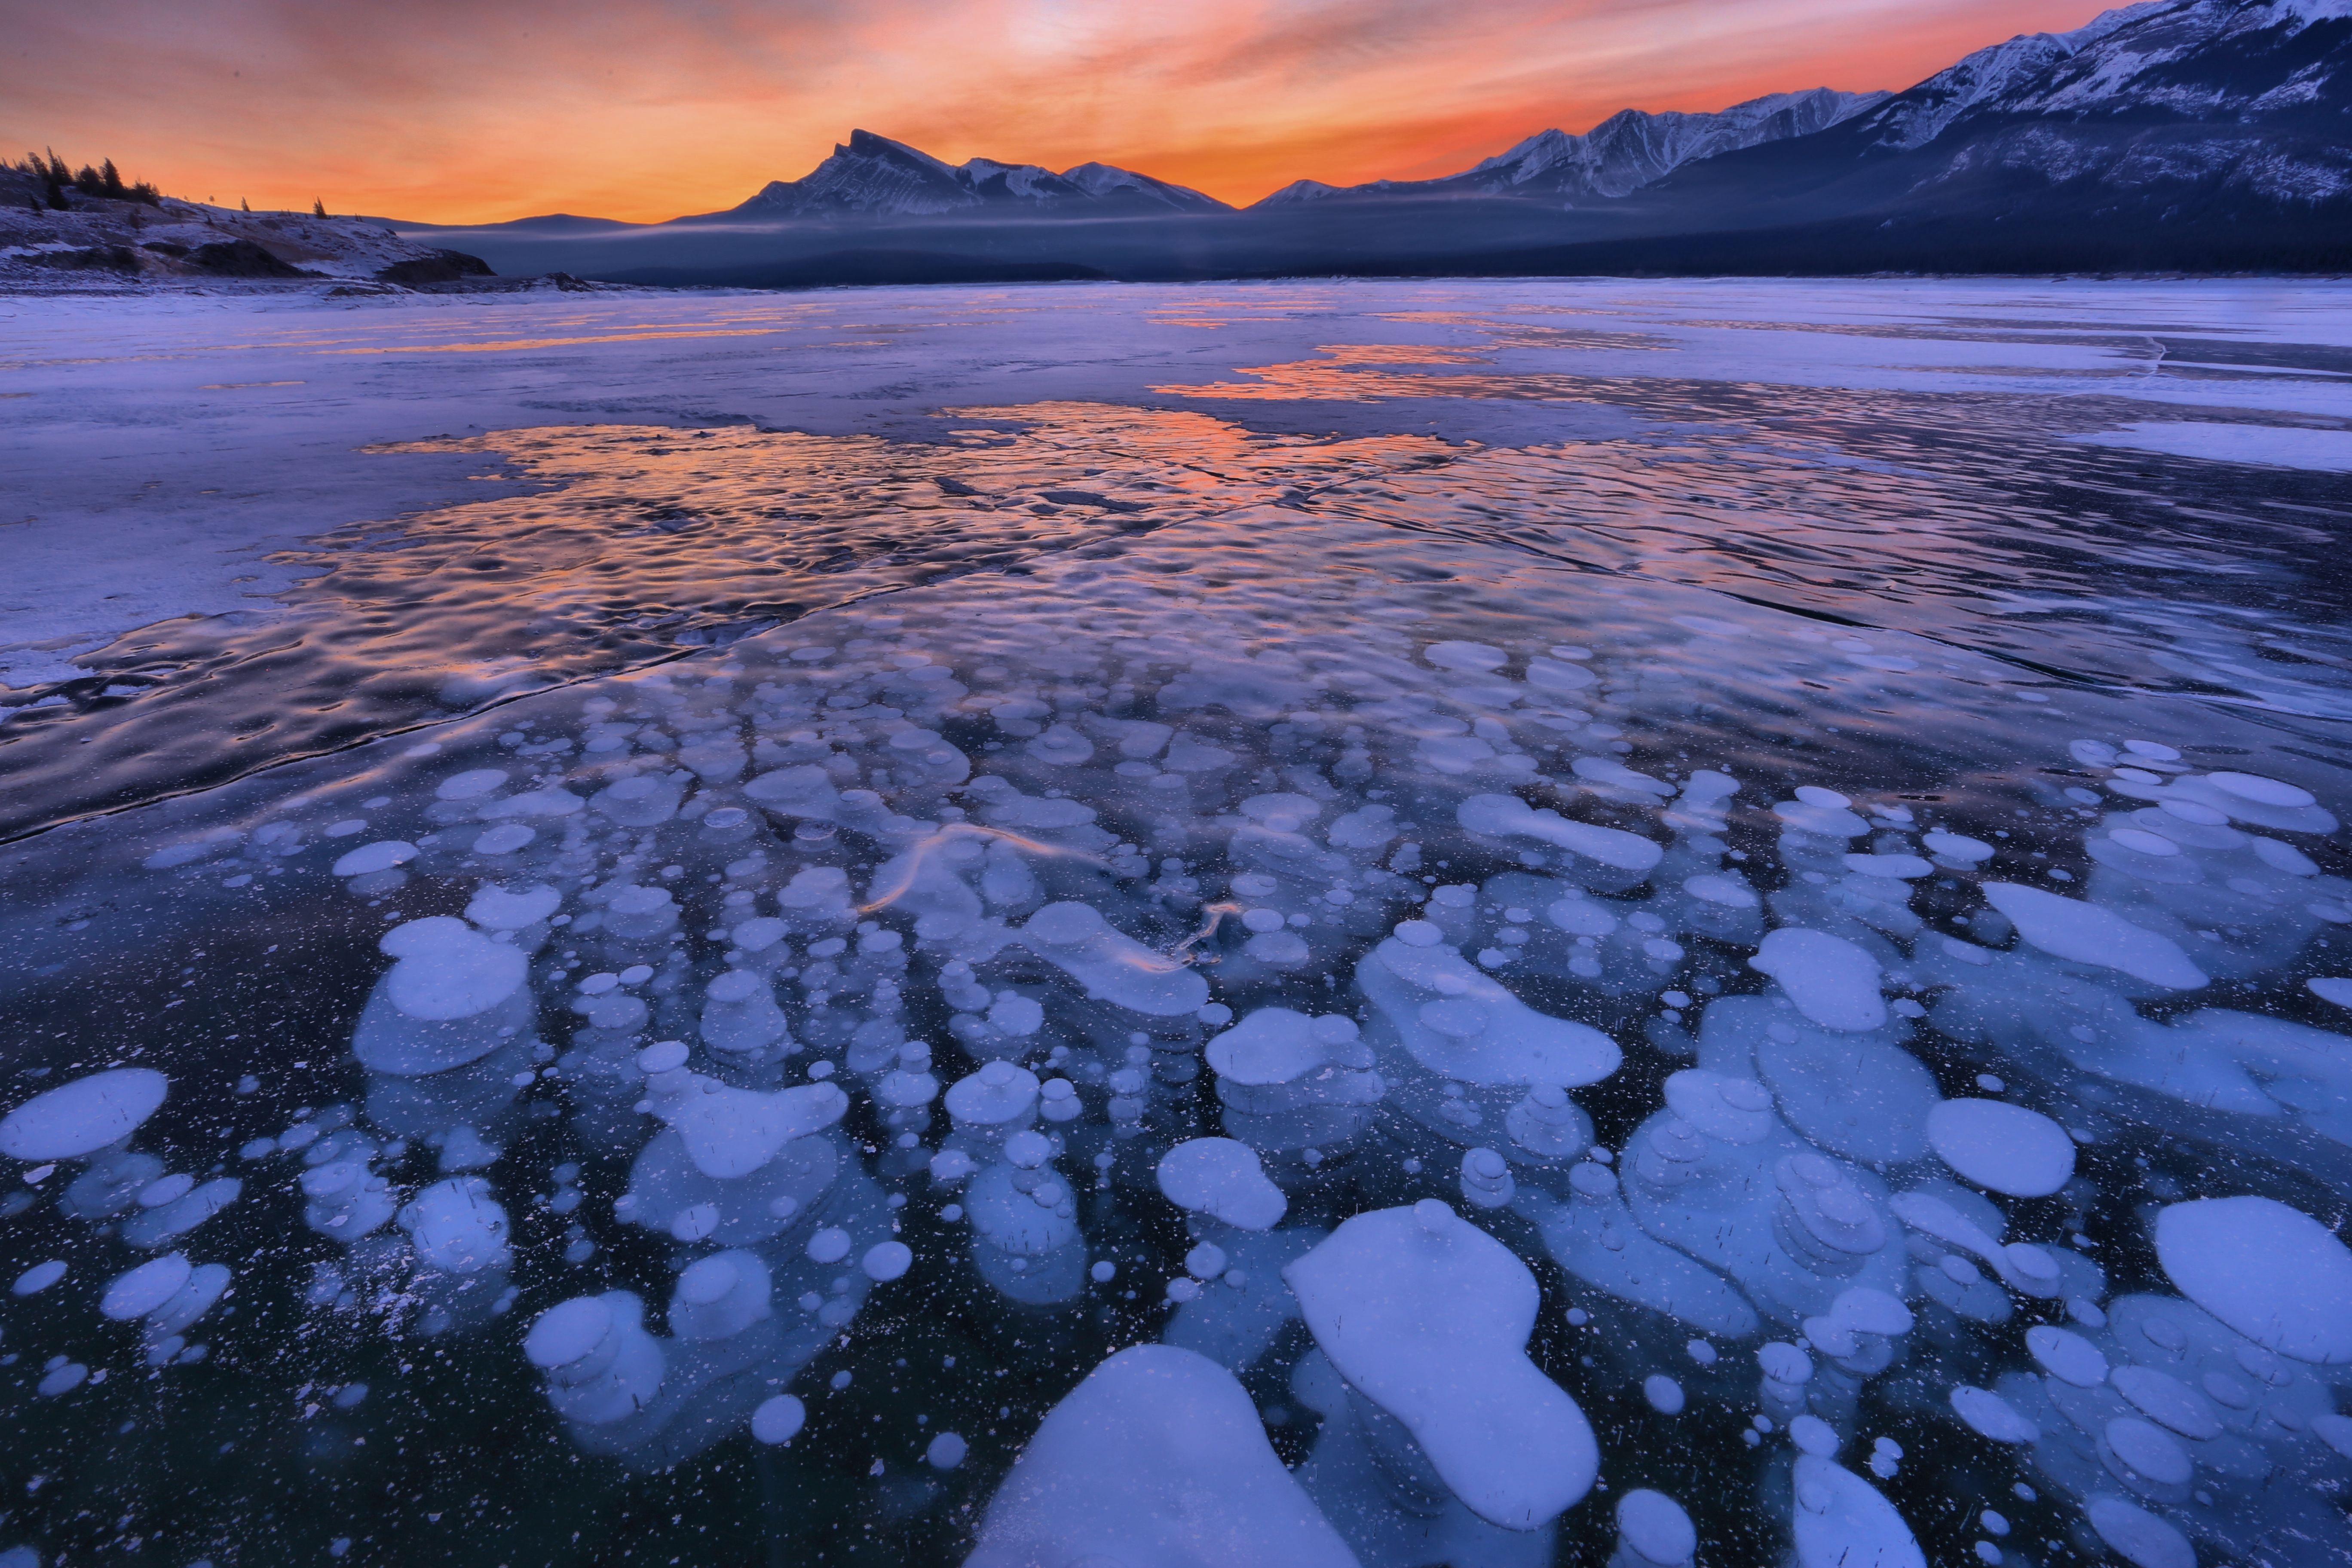 153113 скачать обои Природа, Озеро, Лед, Снег, Зима, Закат, Горизонт - заставки и картинки бесплатно